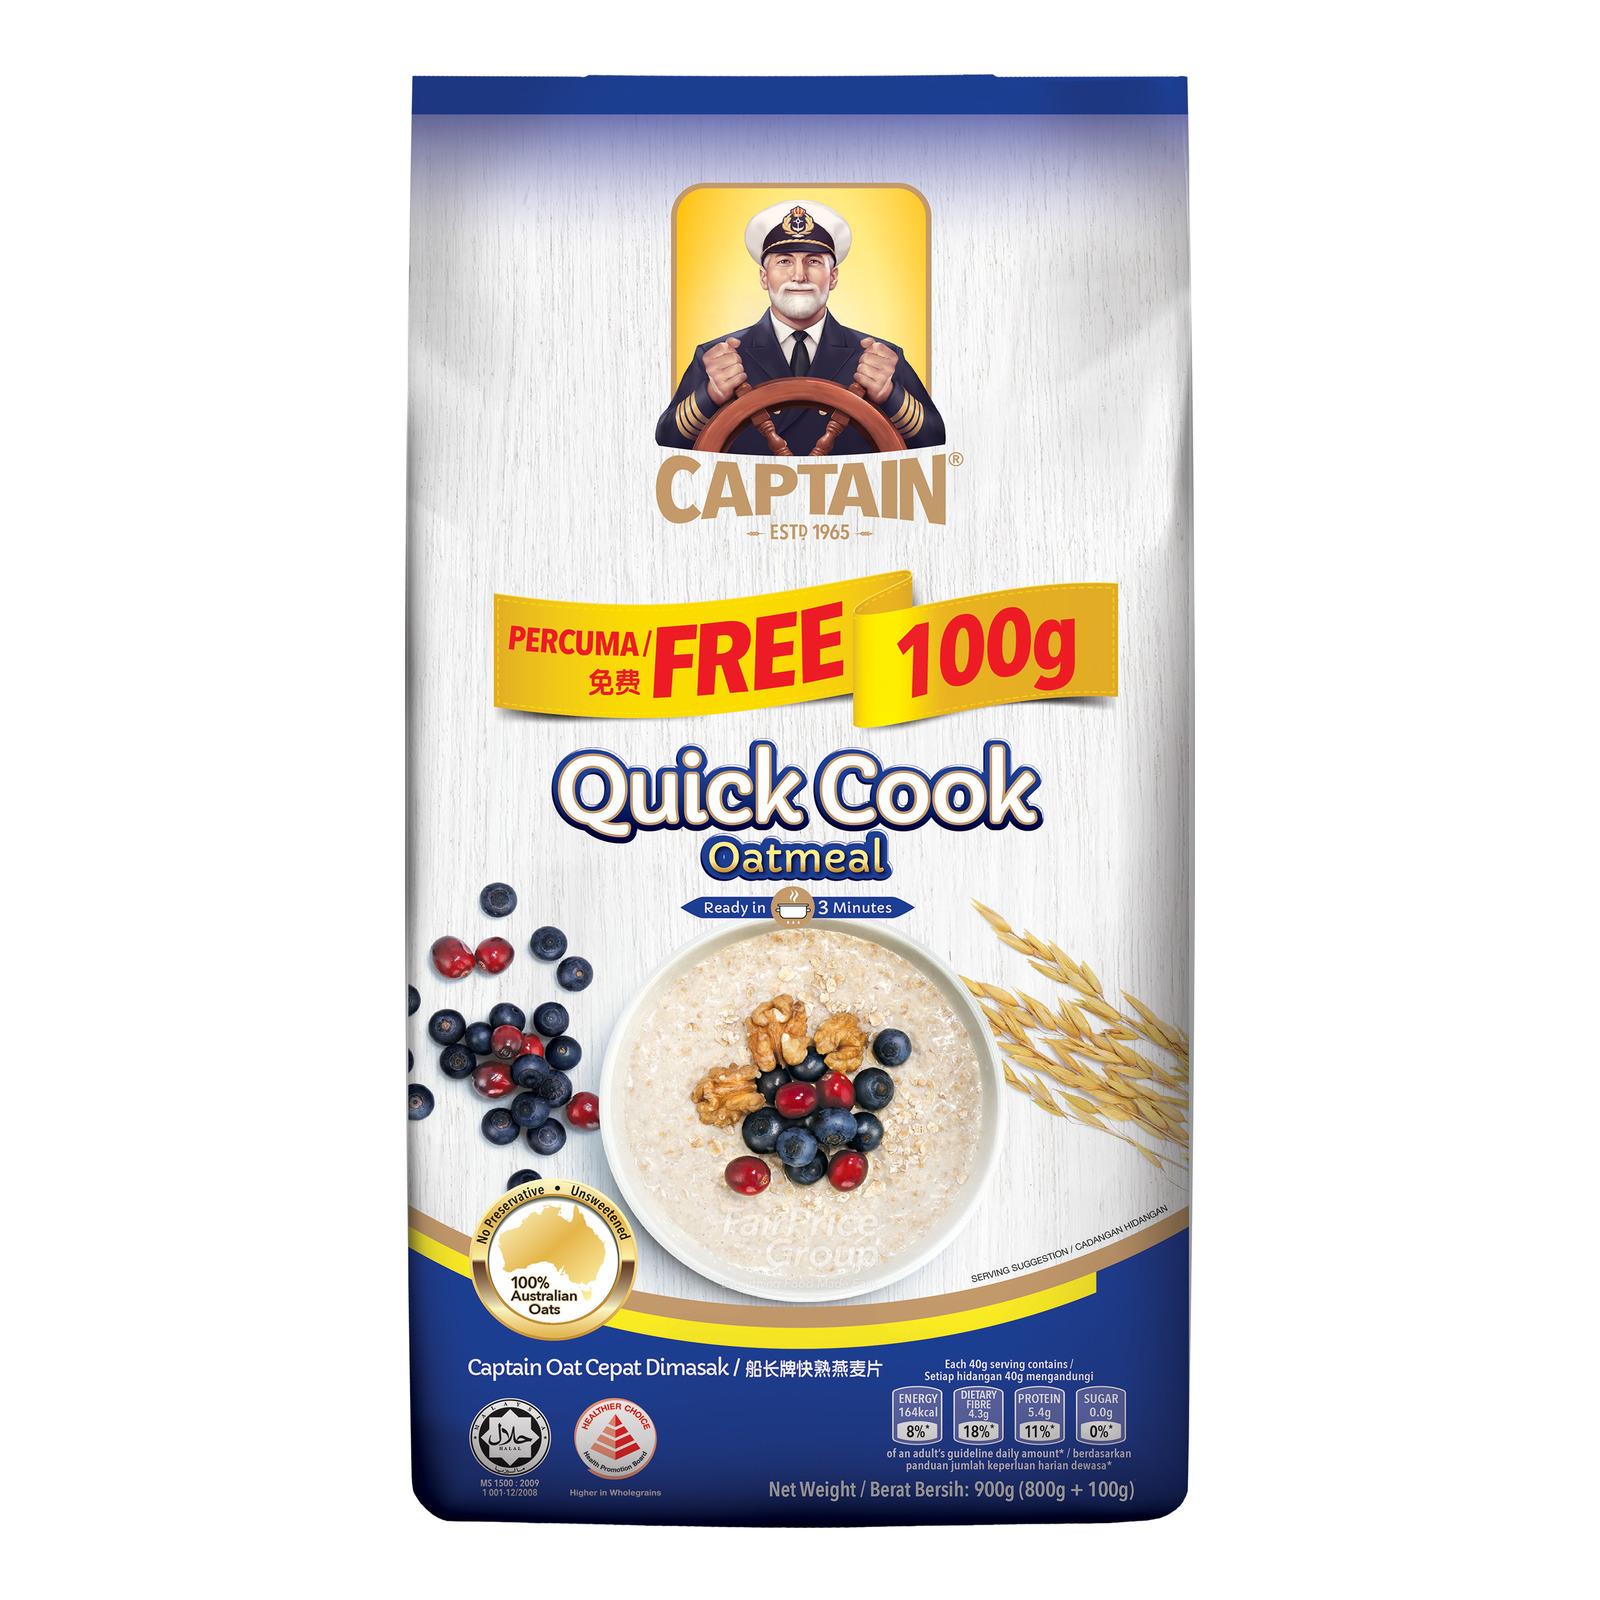 Captain Oats Oatmeal - Quick Cook